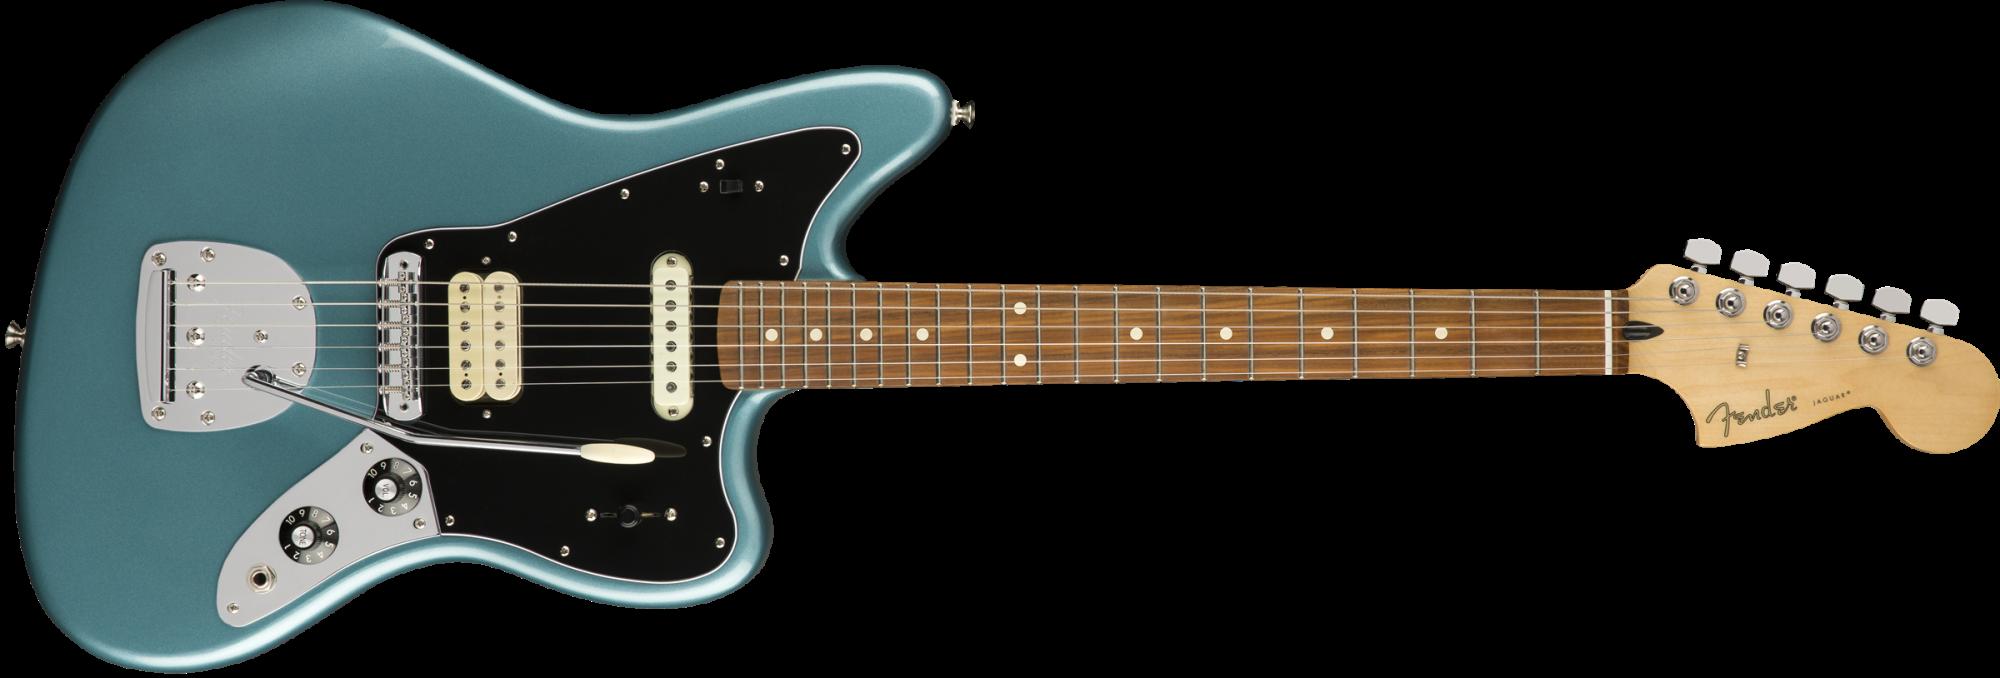 Fender Player Jaguar Guitar - Pau Ferro Fingerboard - Tidepool